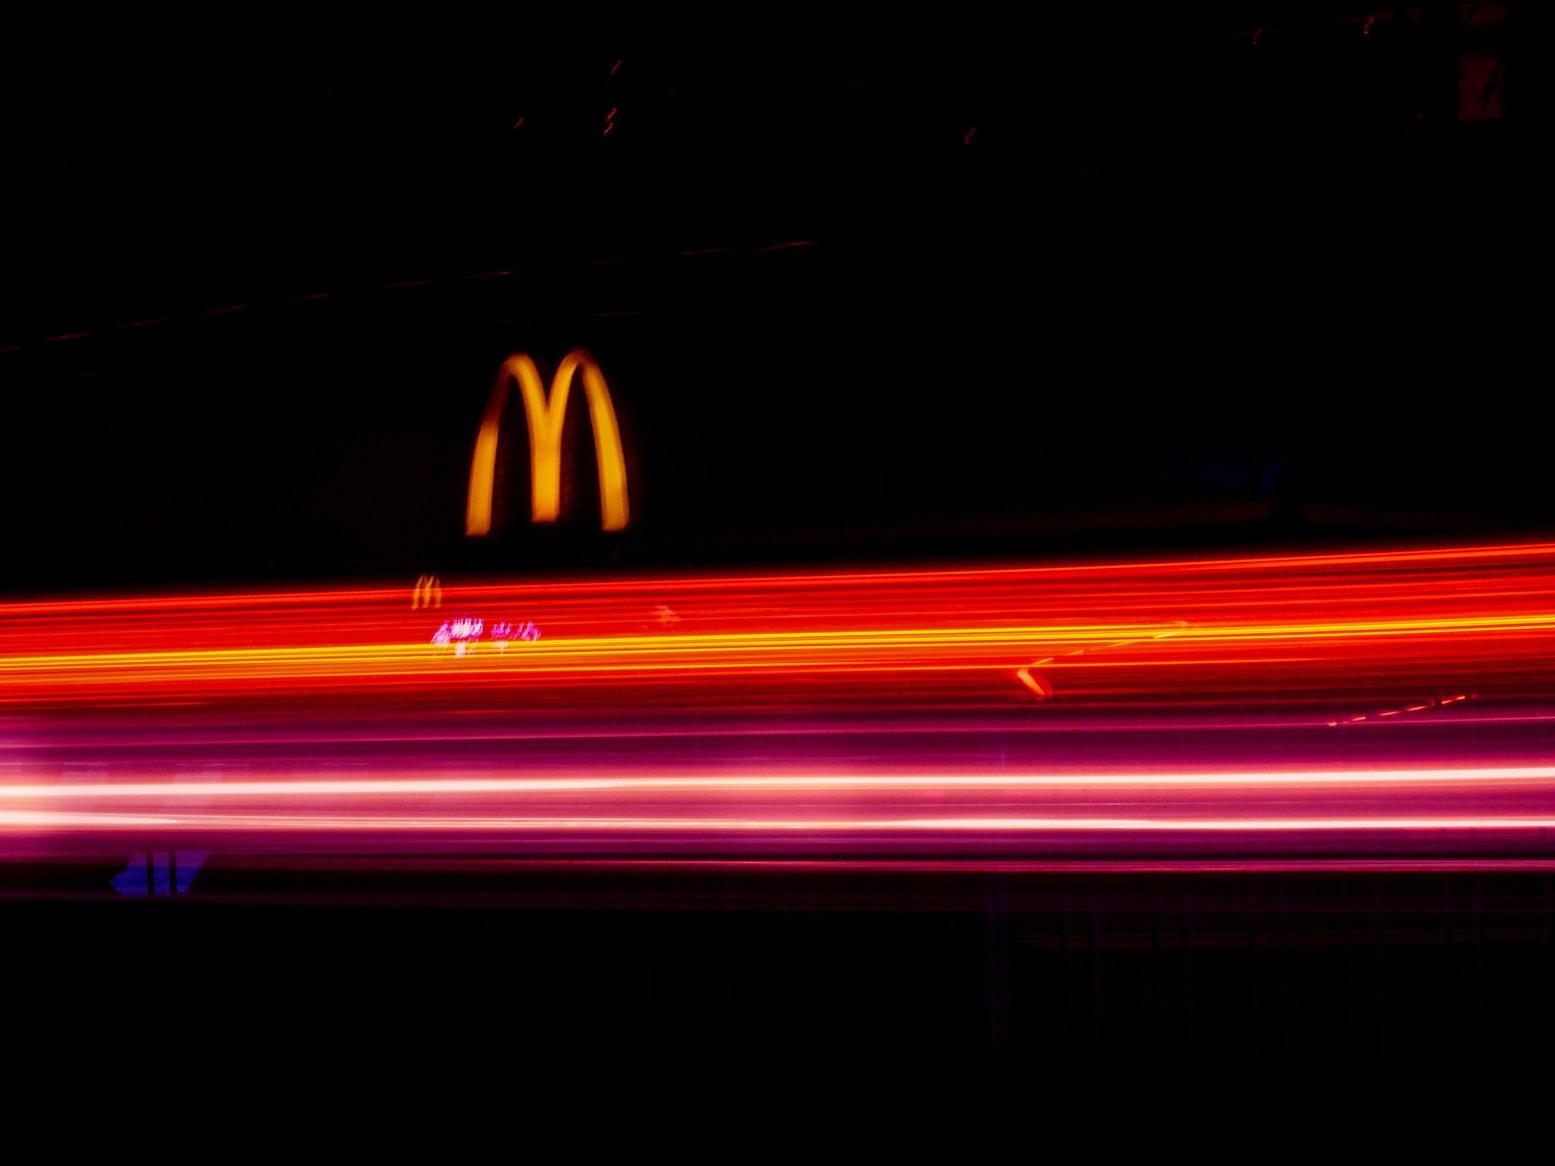 Fast food or past food Macdonalds Inverroy